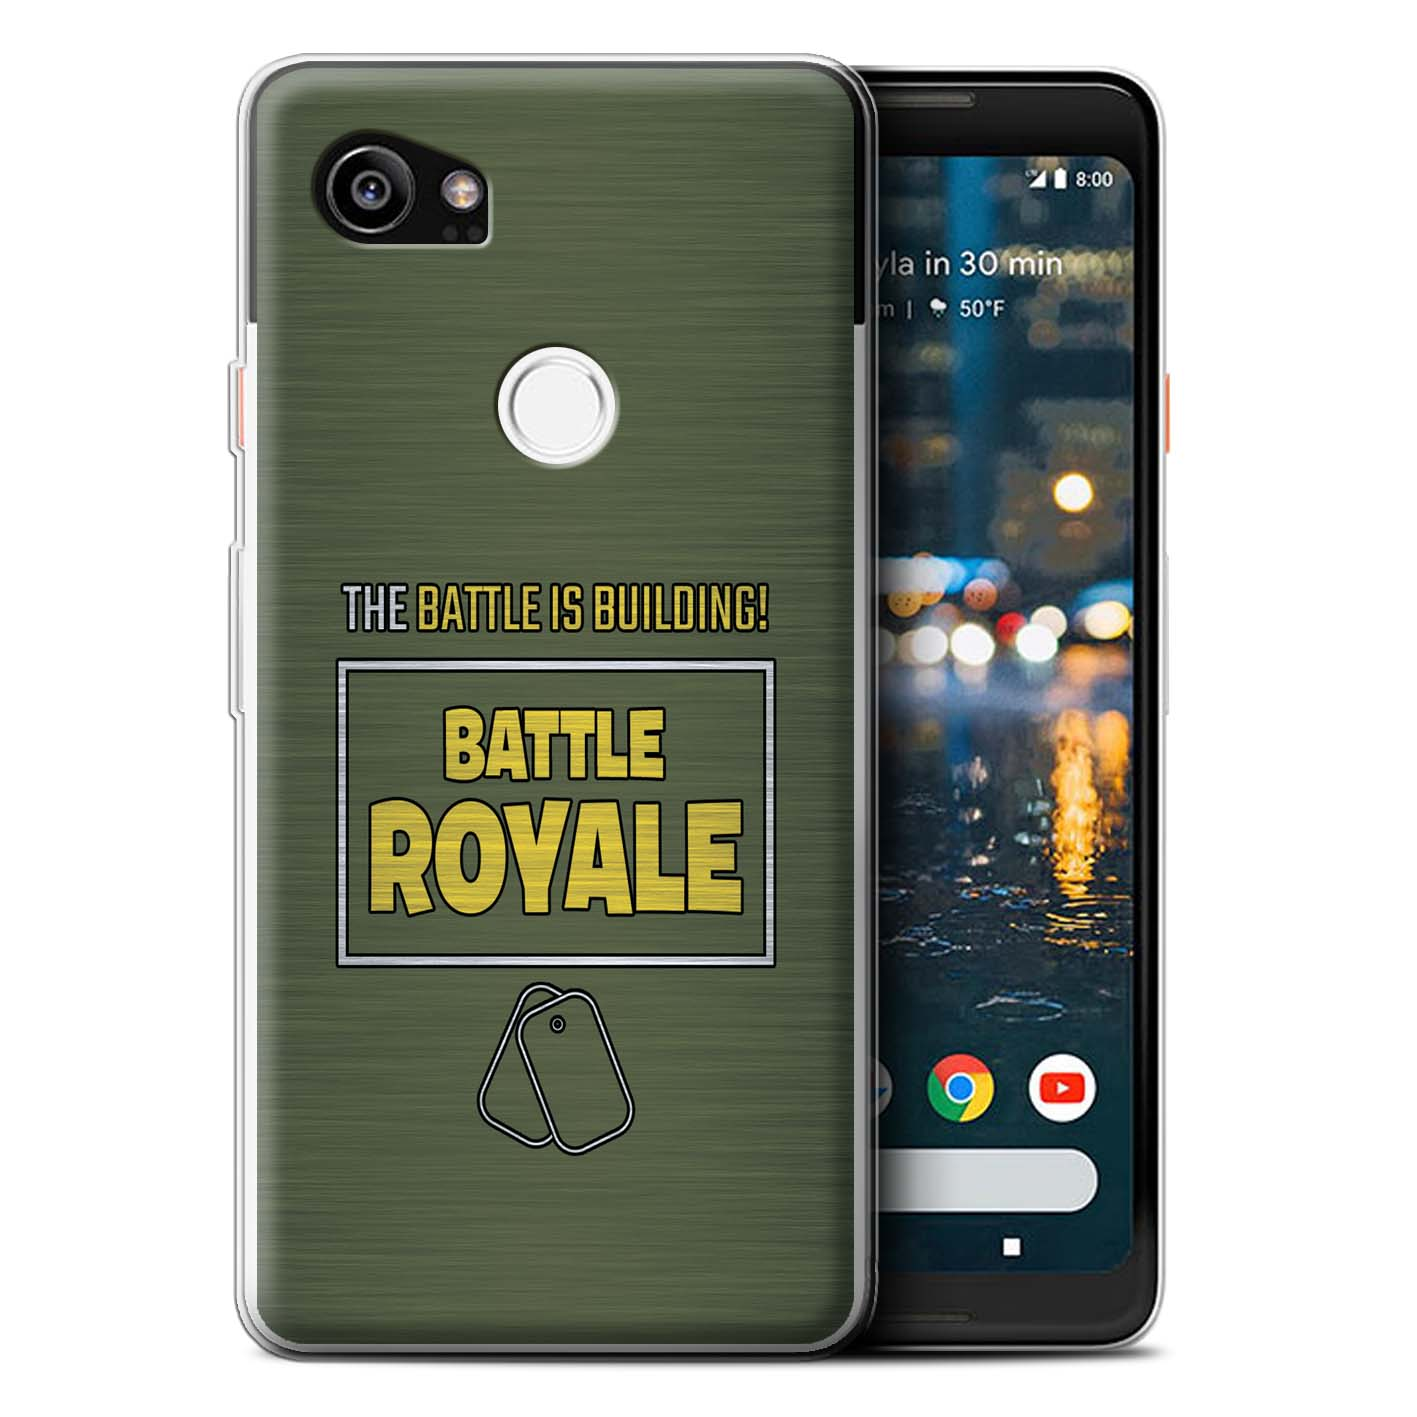 STUFF4-Gel-TPU-Phone-Case-for-Google-Pixel-2-XL-FN-Battle-Royale